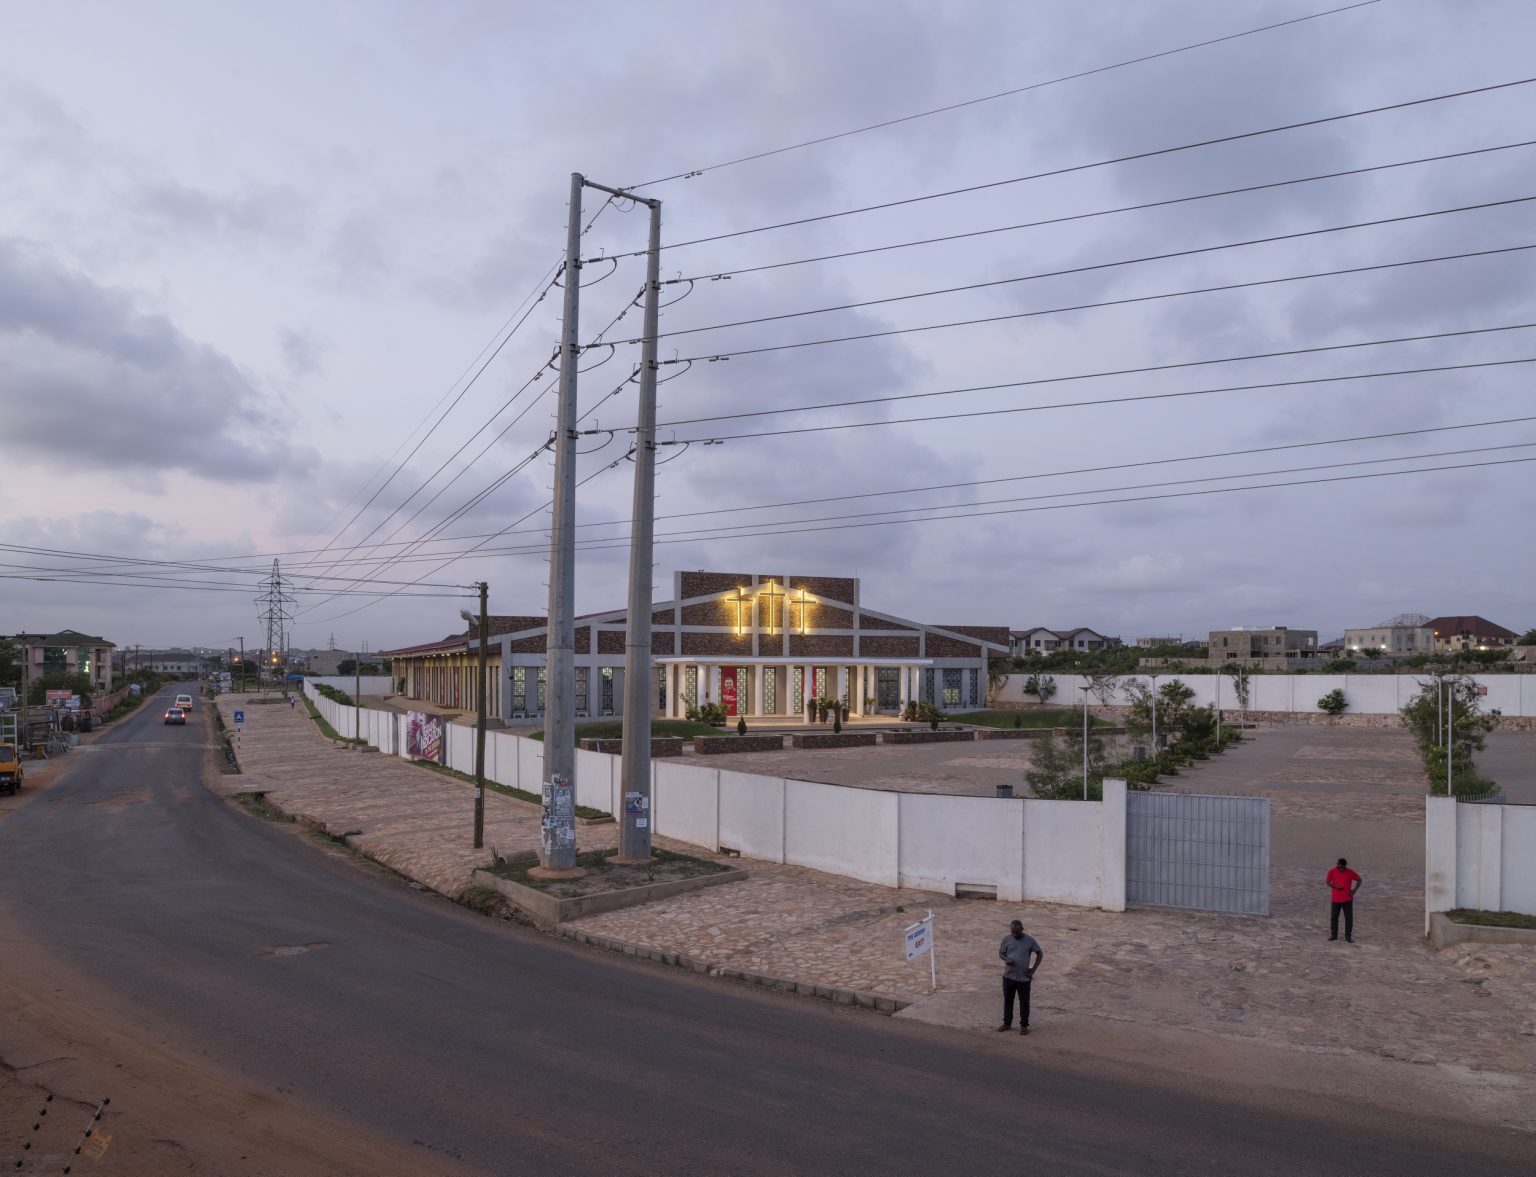 "Legon (Accra), Greater Accra Region, Republic of Ghana, April 2019 - Exterior view of ""Qodesh Family Church, The Qedesh"", a Lighthouse Chapel International branch located in East Legon Hills and inaugurated in 2017. Lighthouse Chapel International(LCI), founded in 1988 byDag Heward-Millsand headquartered inAccra it is considered to be one of the leading charismatic churches inGhana, and has over 3000 branches in over 50 countries inAfrica,Europe,Asia, theCaribbean,Australia, theMiddle Eastand theAmericas. Lighthouse Chapel International is one of the largest of the Pentecostal churches that have appeared since the late 1970s in cities in Africa. Its founder is nowadays considered among the richest pastors in Ghana. ><  Legon (Accra), Grande Regione di Accra, Repubblica del Ghana, aprile 2019 - Veduta esterna della ""Qodesh Family Church, The Qedesh"", sede della Lighthouse Chapel International situata a East Legon Hills ed inaugurata nel 2017. Lighthouse Chapel International (LCI), fondata nel 1988 da Dag Heward-Mills e con sede ad Accra, è considerata una delle principali chiese carismatiche del Ghana e conta oltre 3000 filiali in oltre 50 paesi in Africa, Europa, Asia, i Caraibi, l'Australia, il Medio Oriente e le Americhe. Lighthouse Chapel International è una delle più grandi chiese pentecostali apparse dalla fine degli anni '70 nelle città dell'Africa. Il suo fondatore è oggi considerato tra i pastori più ricchi del Ghana."